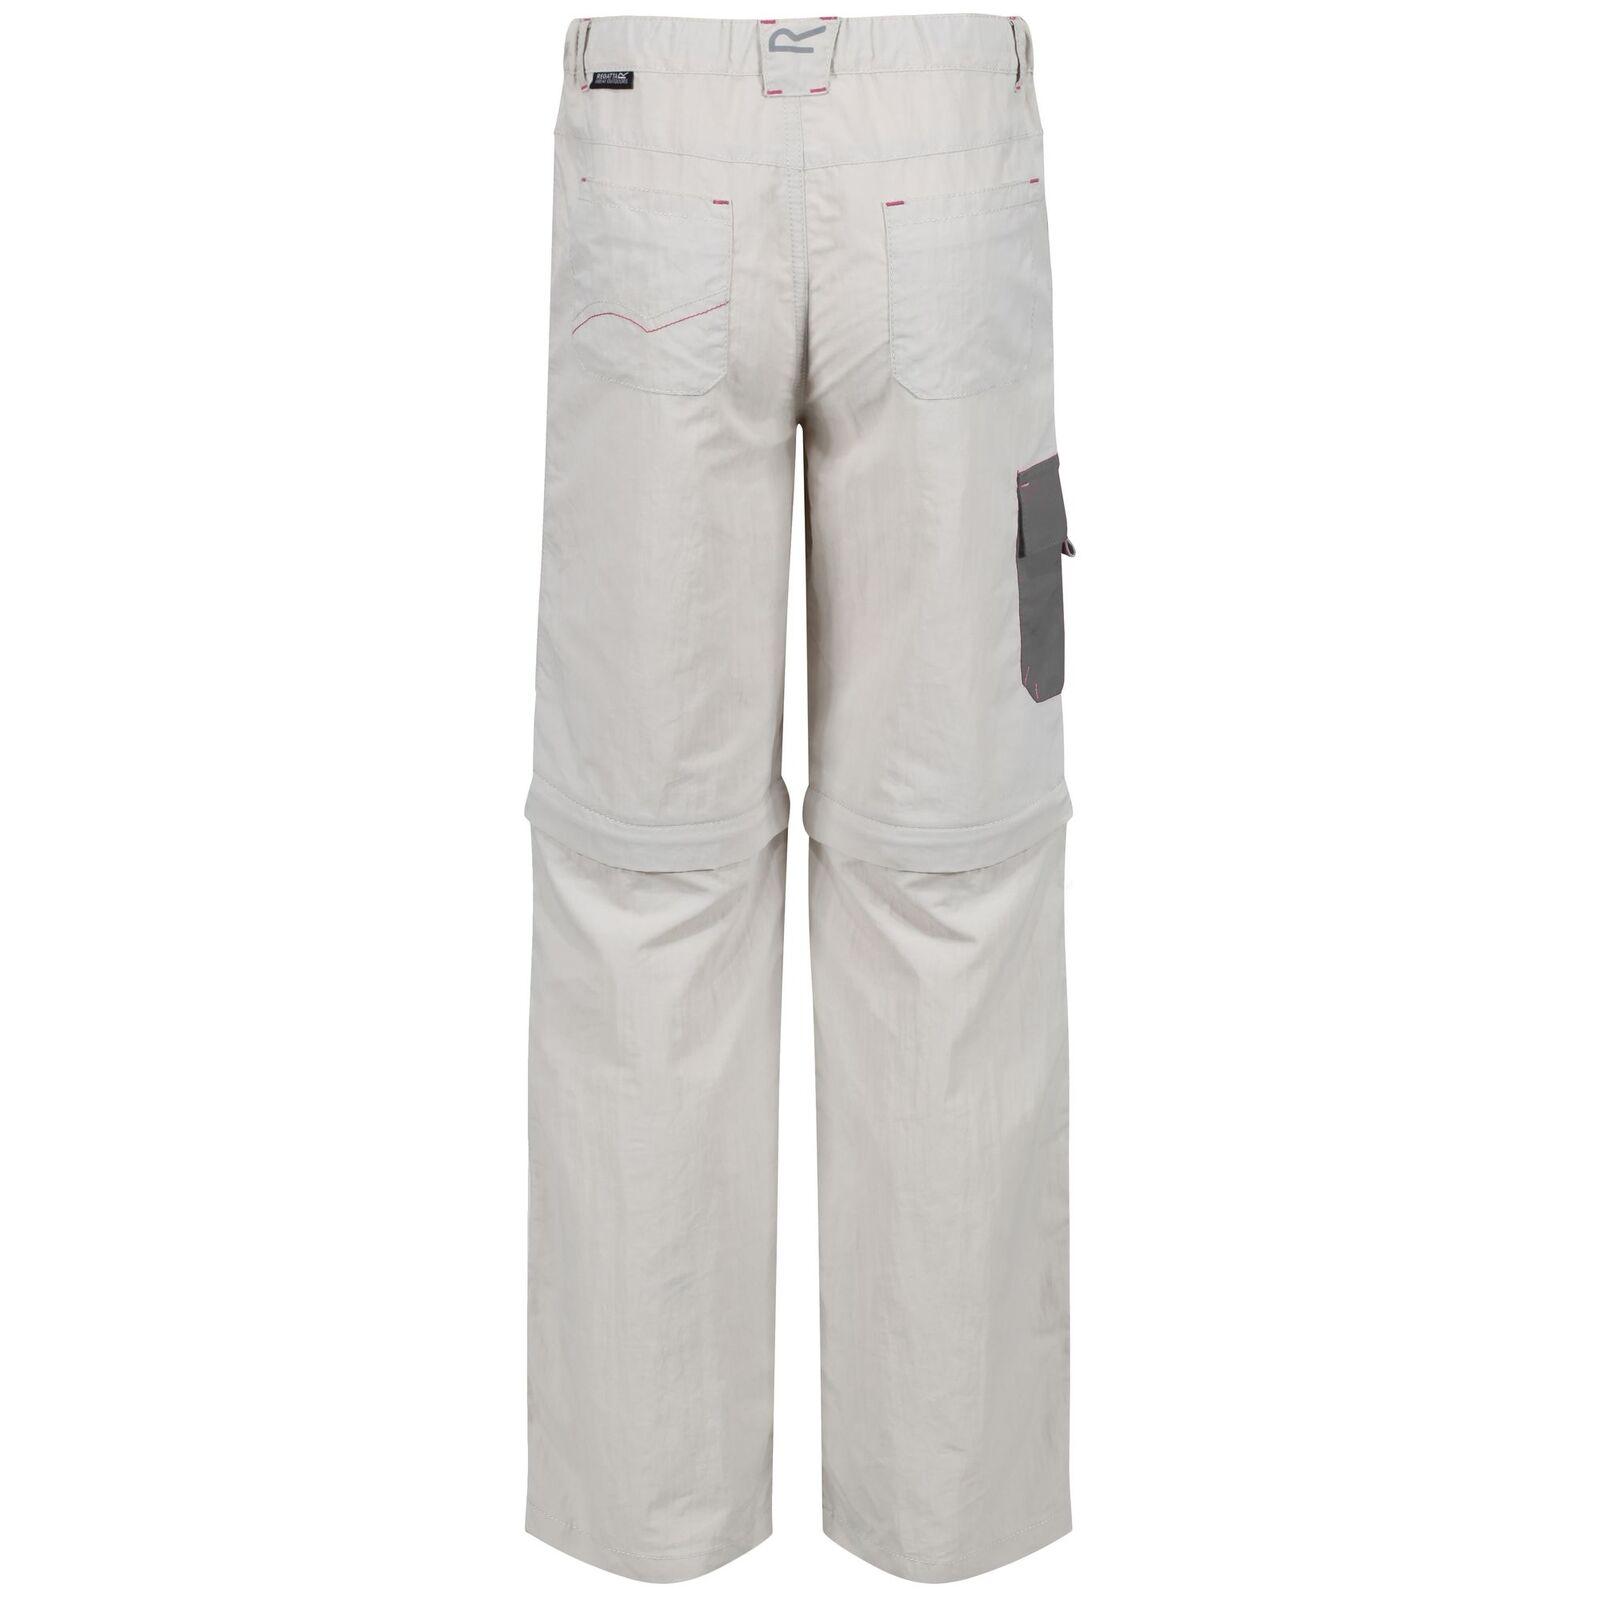 Regatta Great Outdoors Childrens//Boys Sorcer Zip-Off Pants RG2101